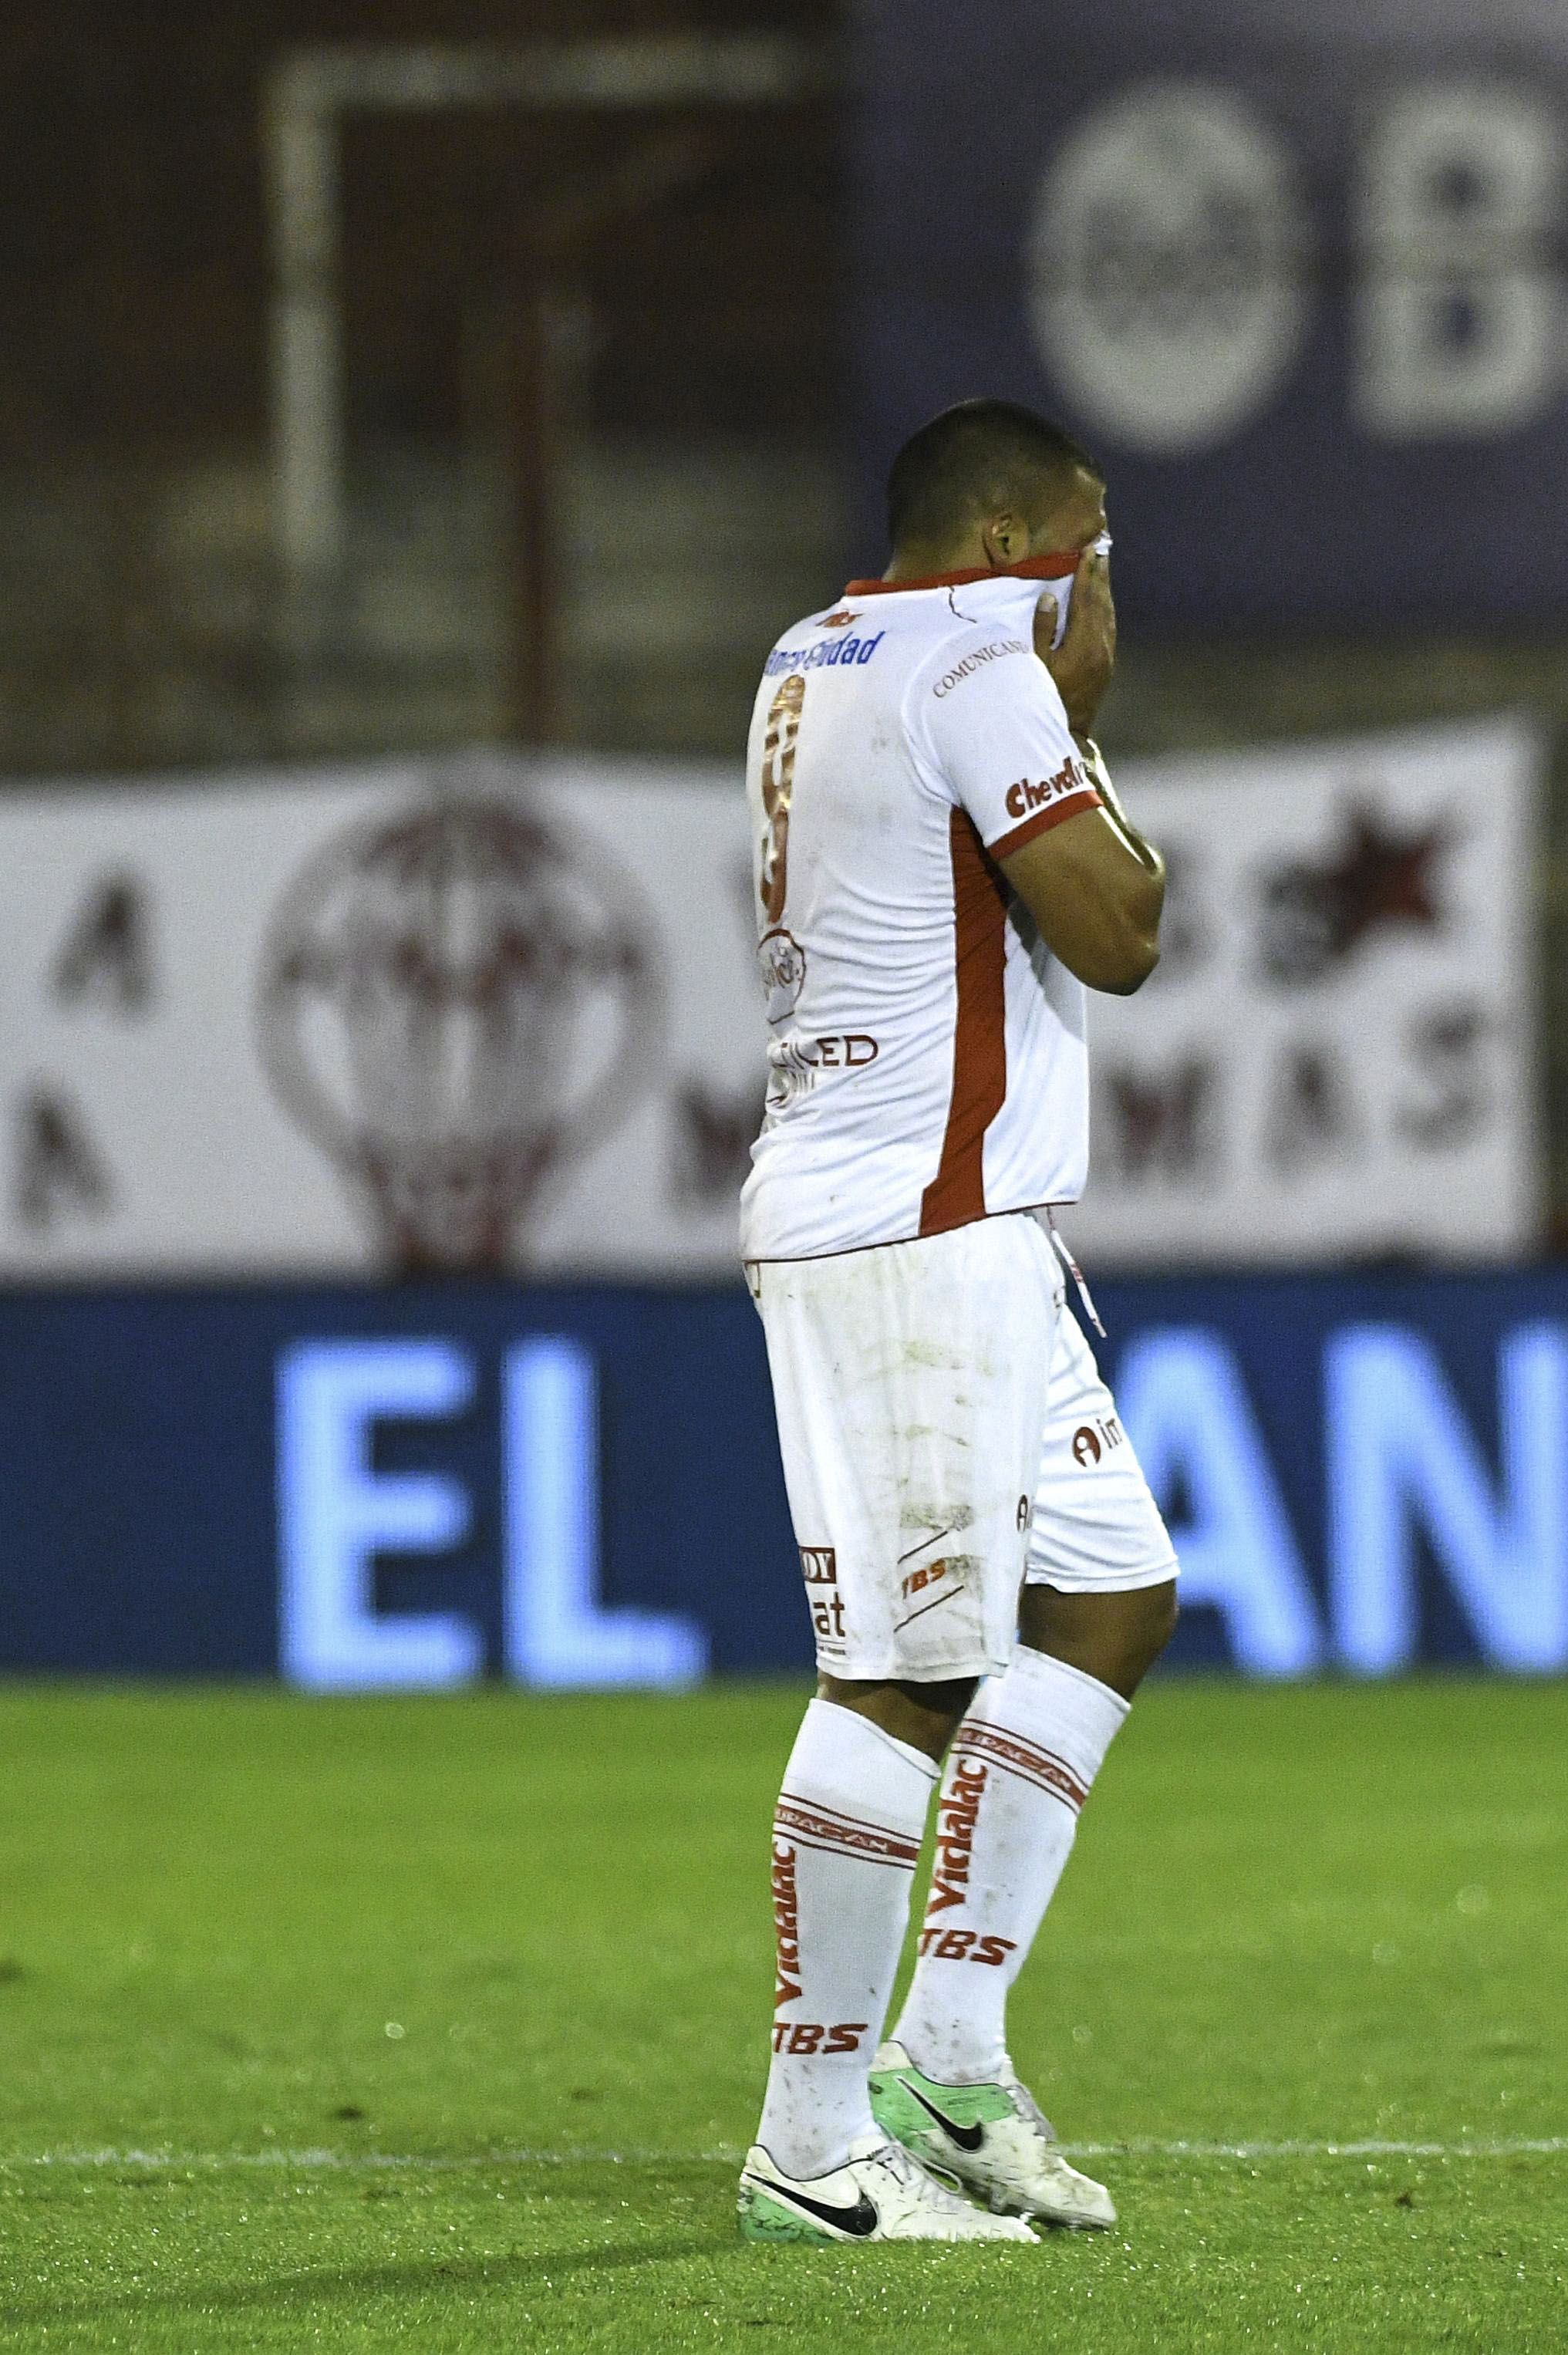 El delantero hizo cuatro goles en esta etapa en el Globo